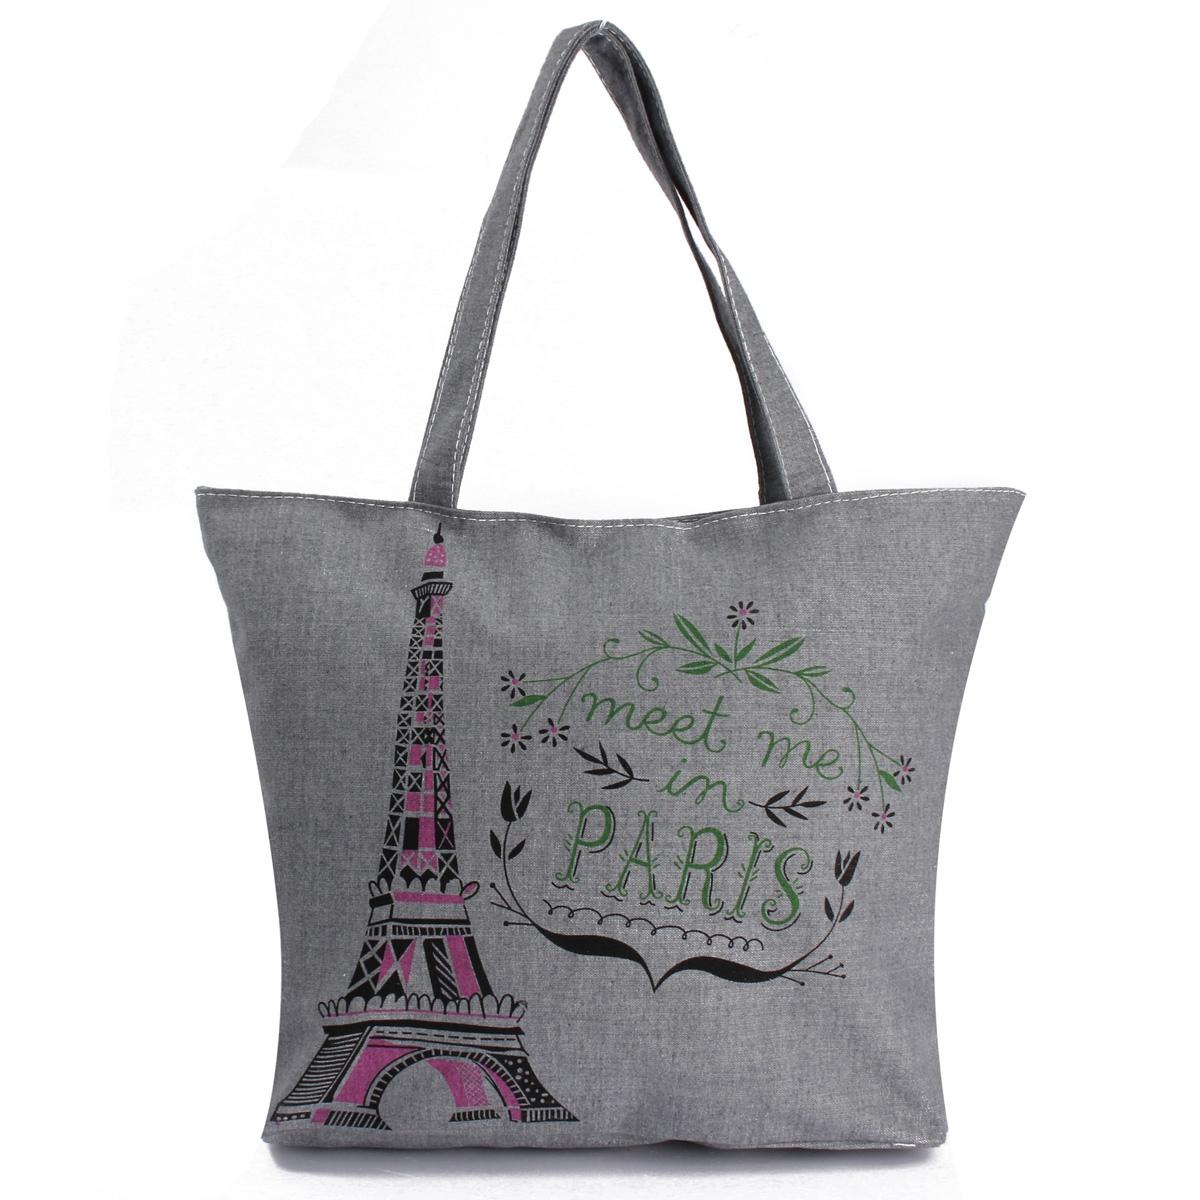 Fashion Women Lady Canvas Cute Handbag Shoulder Beach Bag Shopping Tote Zipper